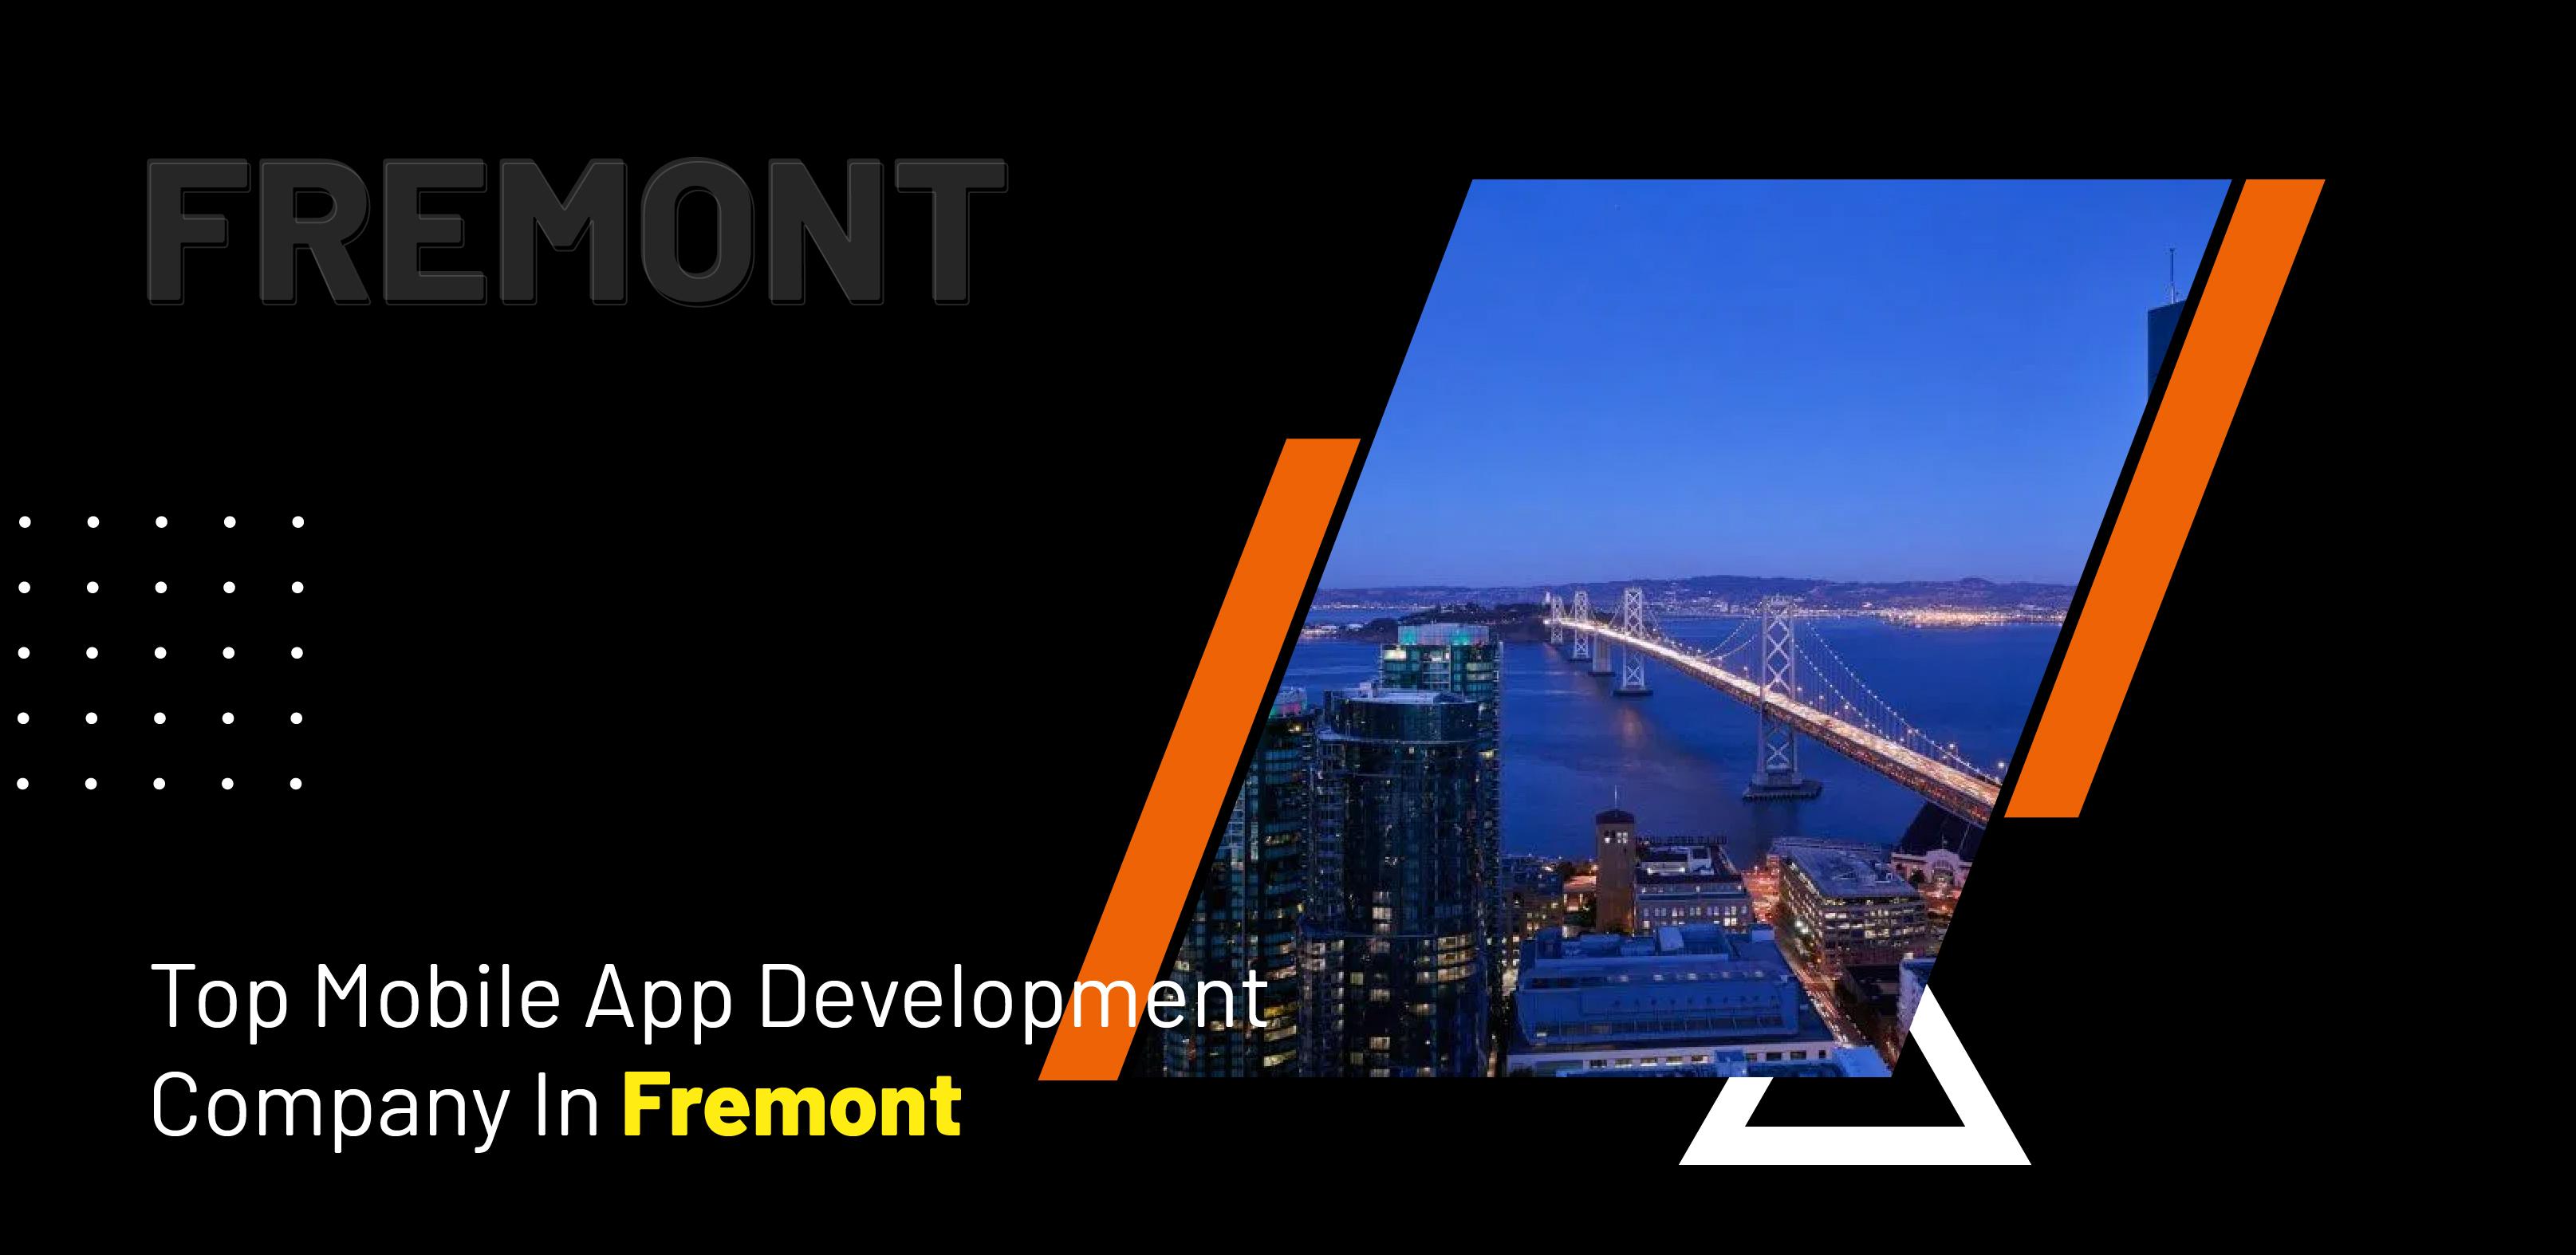 Top Mobile App Development Company in Fremont - WebClues Infotech